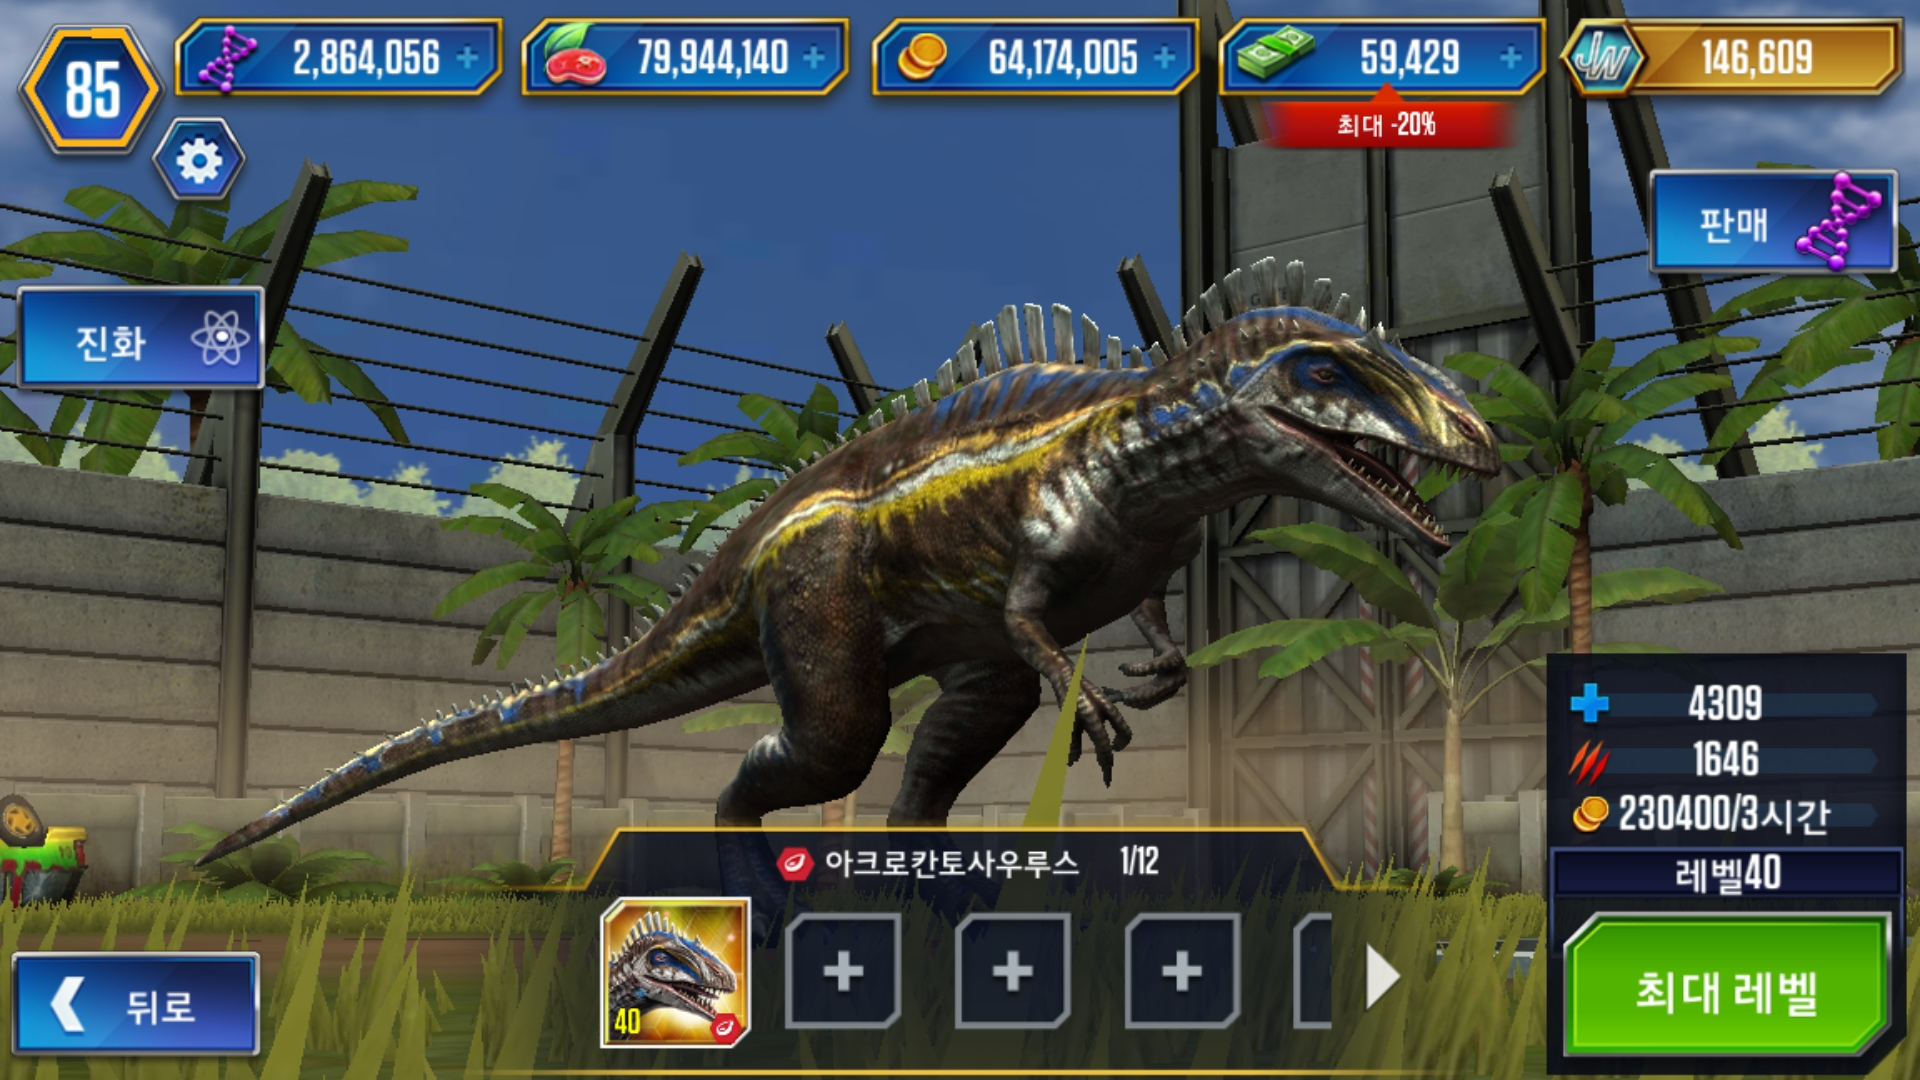 Screenshot_20200412-210204_Jurassic World.jpg